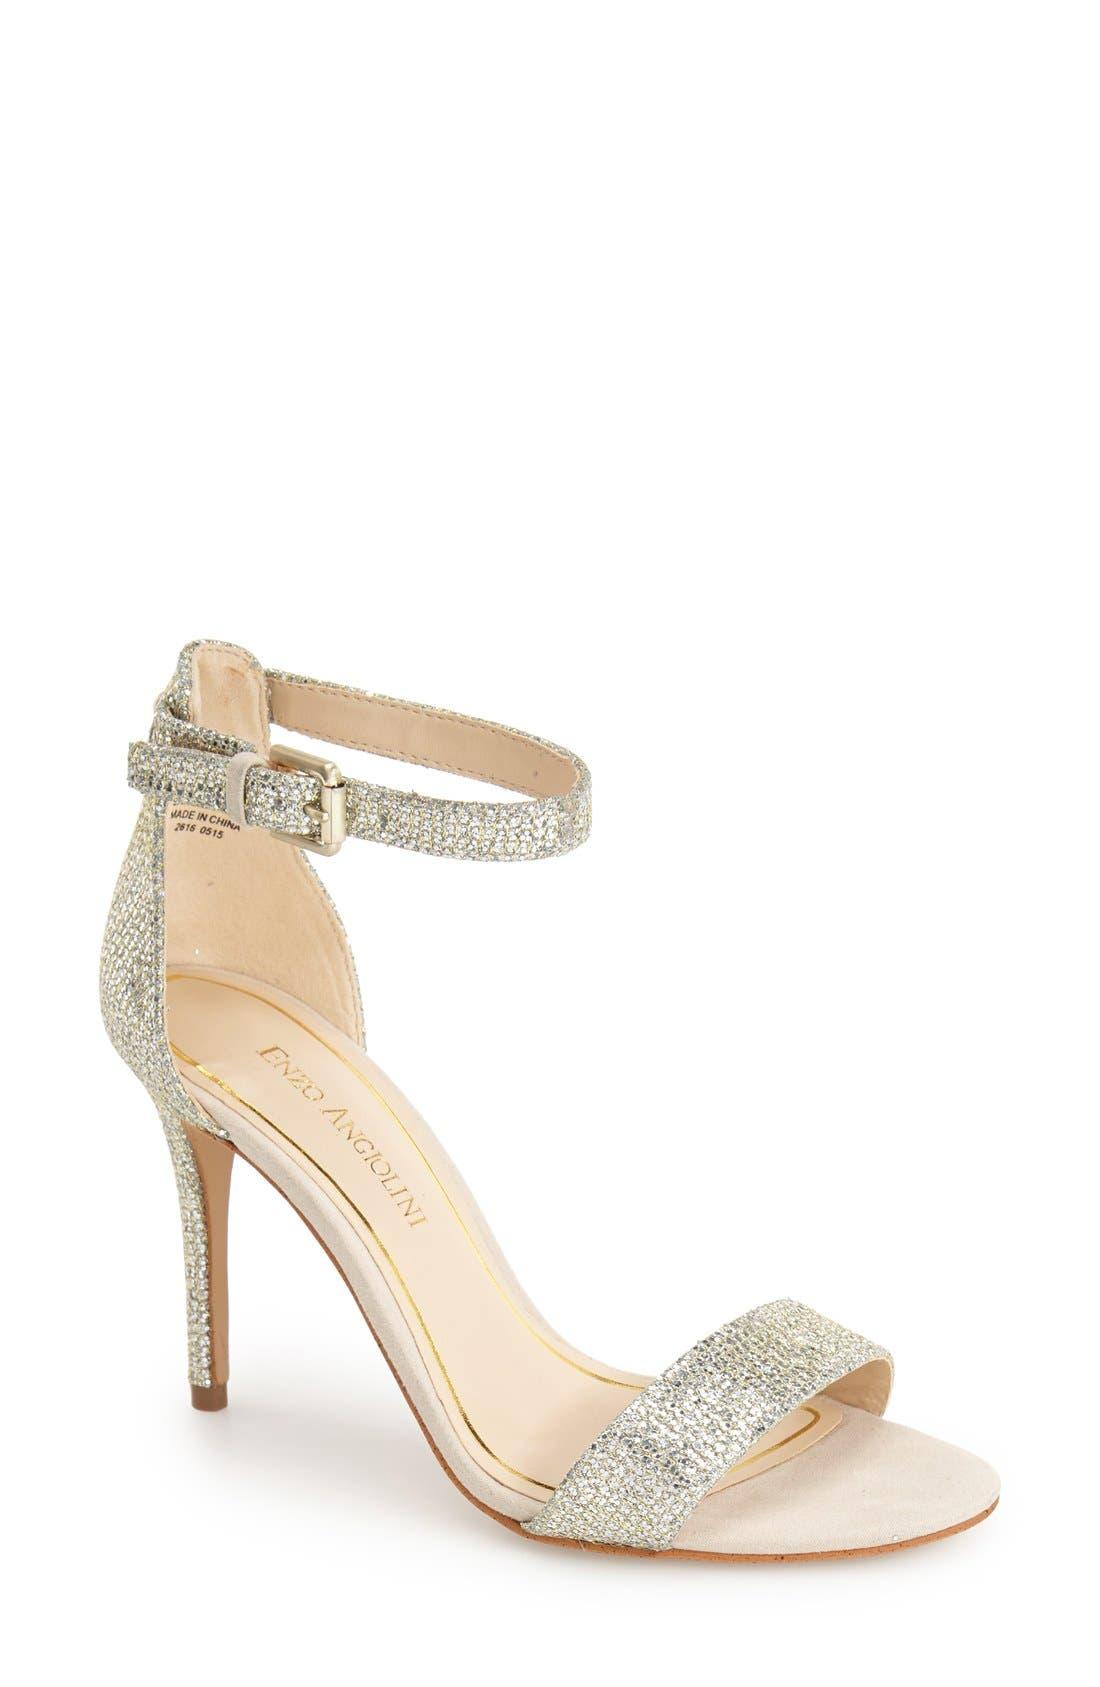 Alternate Image 1 Selected - Enzo Angiolini 'Manna' Ankle Strap Sandal (Women)